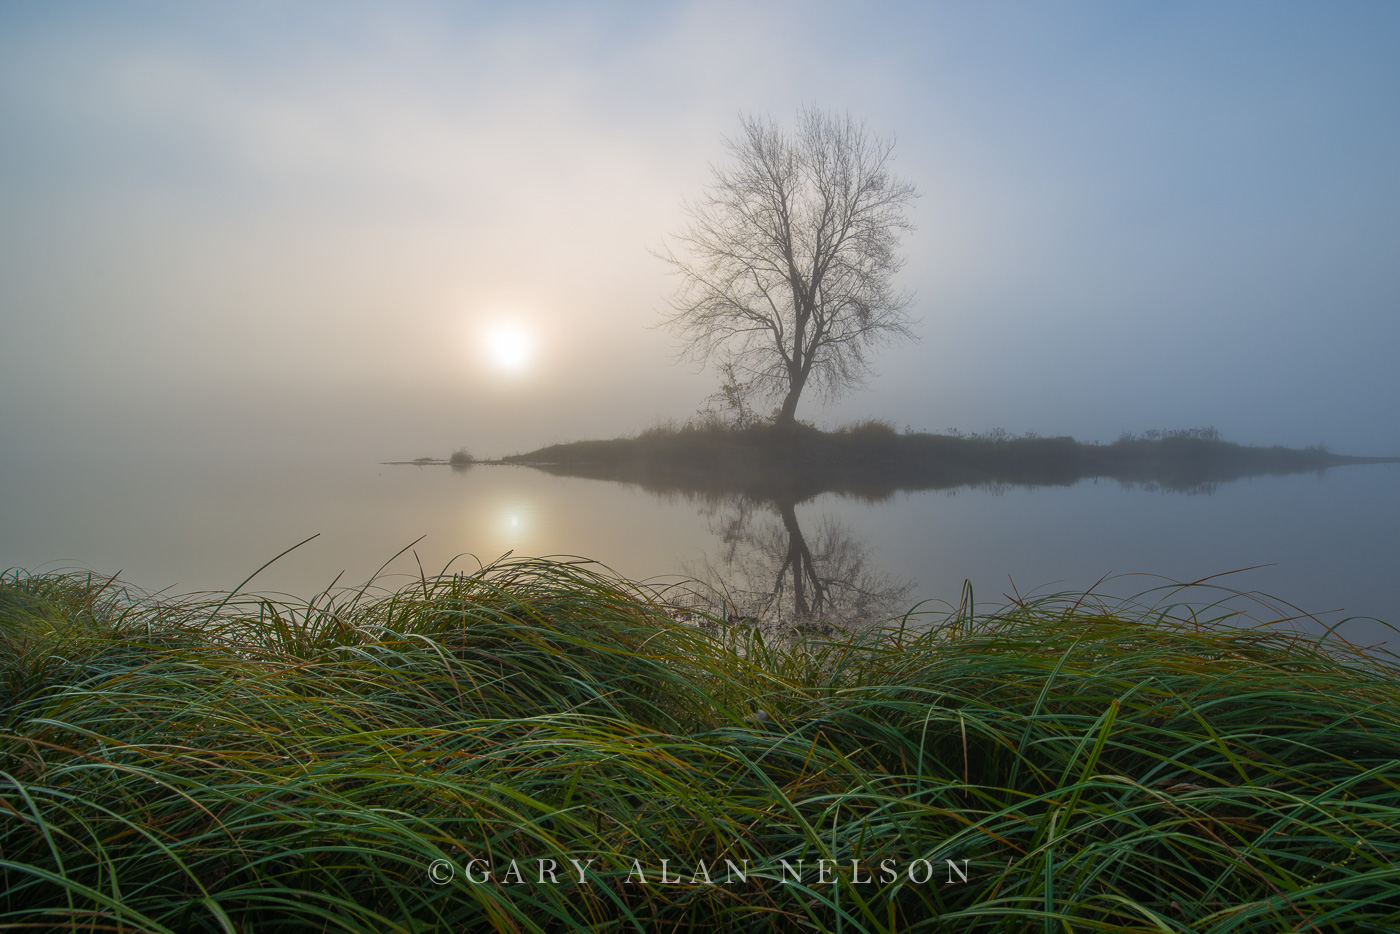 st. croix river, minnesota, island, lone tree, wisconsin, grasses, photo